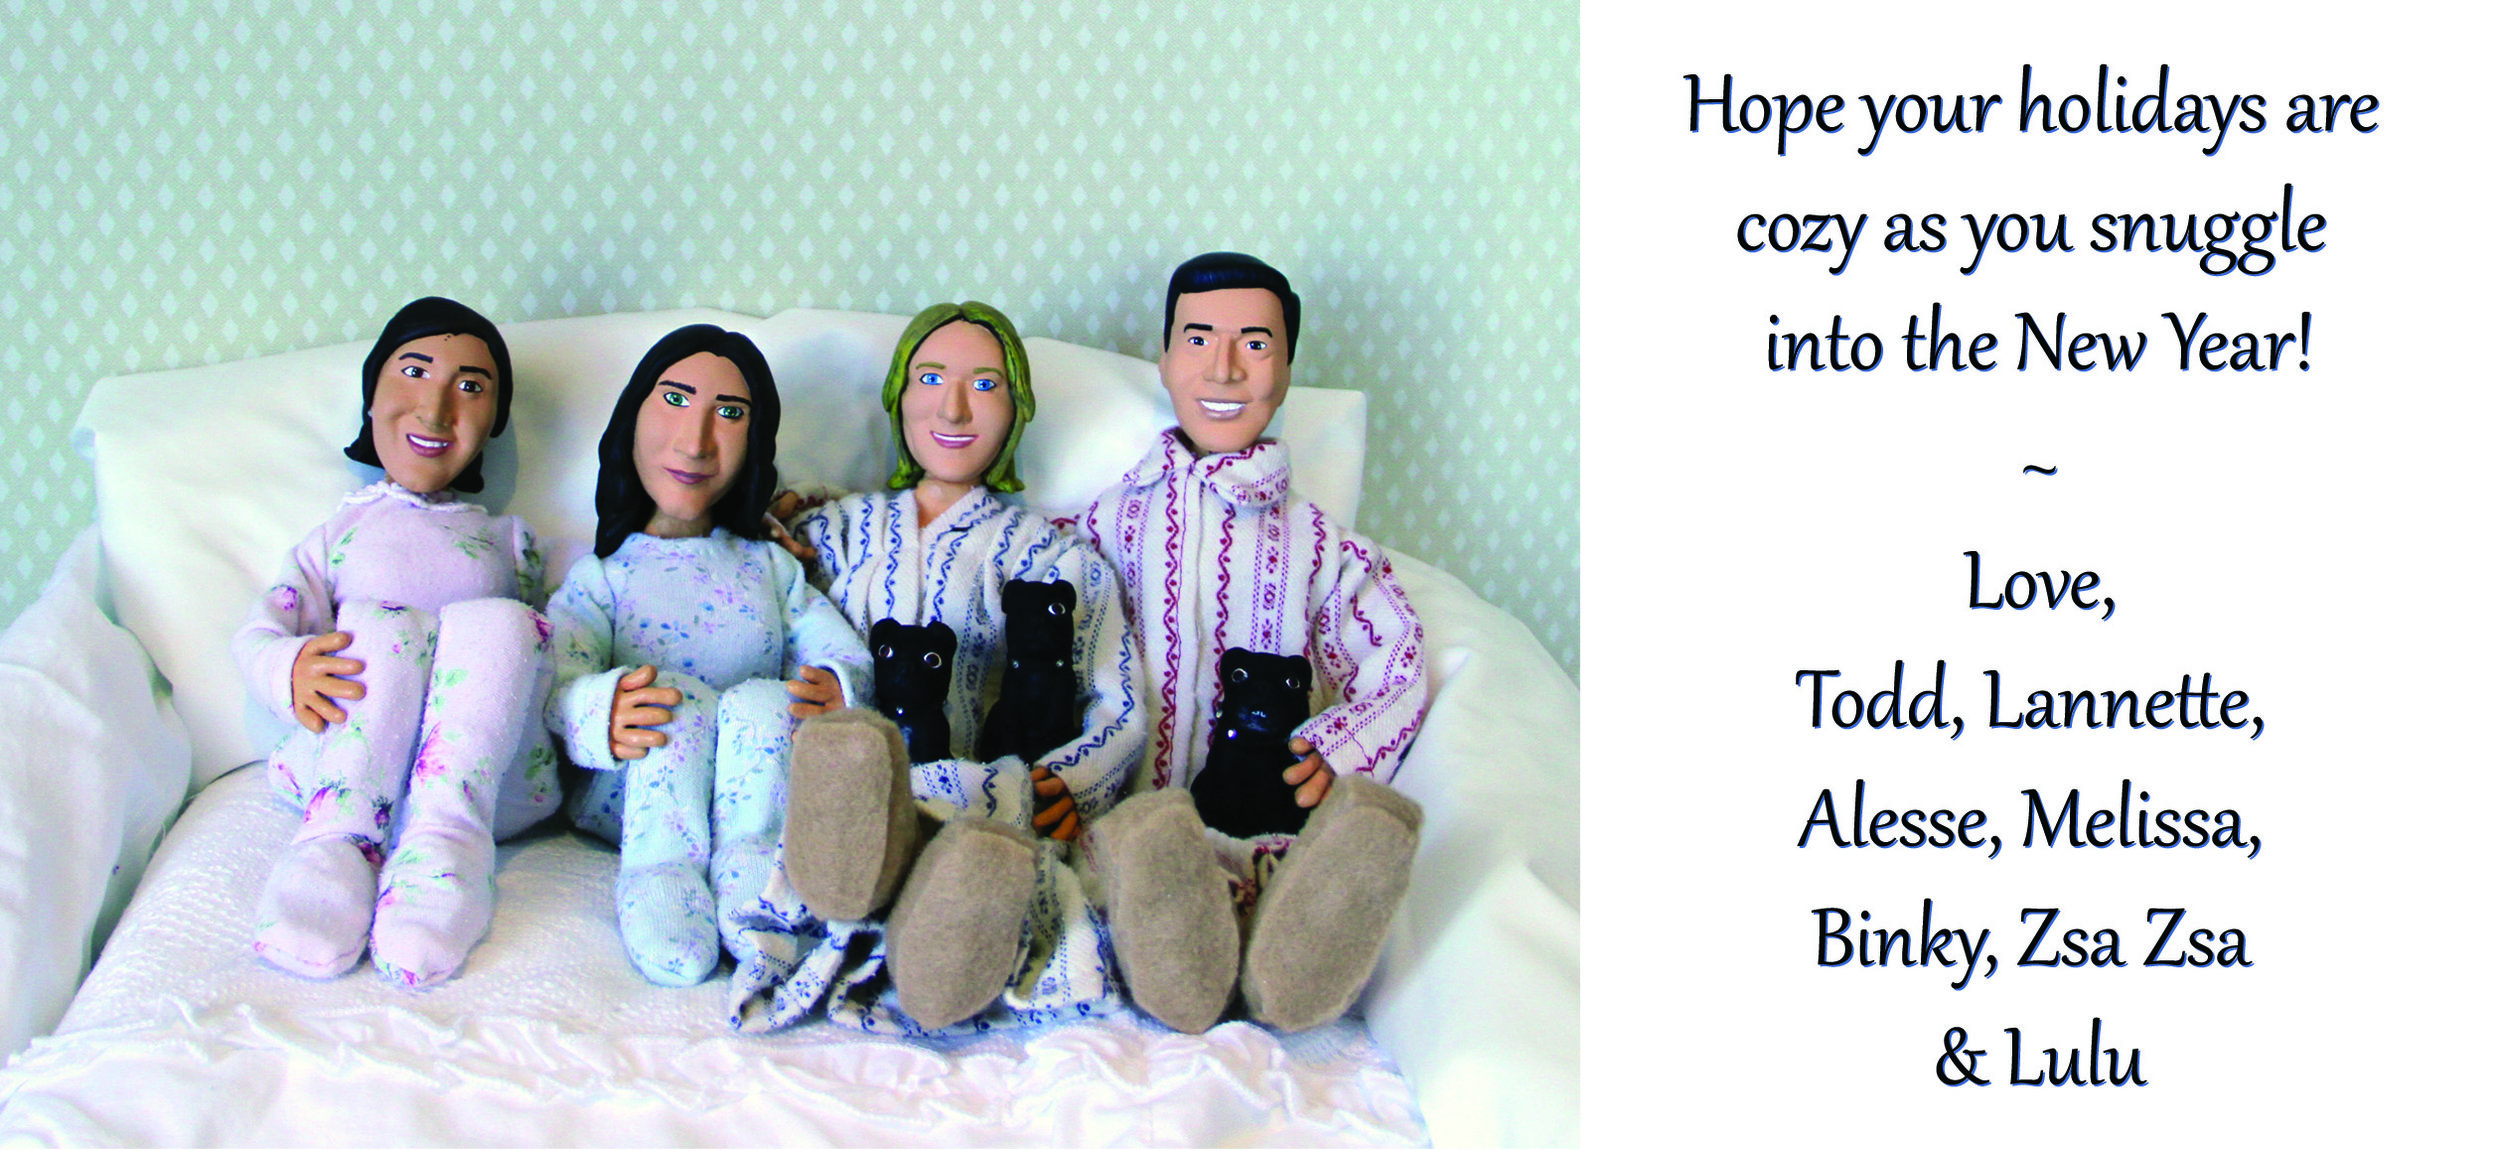 melissa-bloom-puppet-holiday-card-2014.jpg